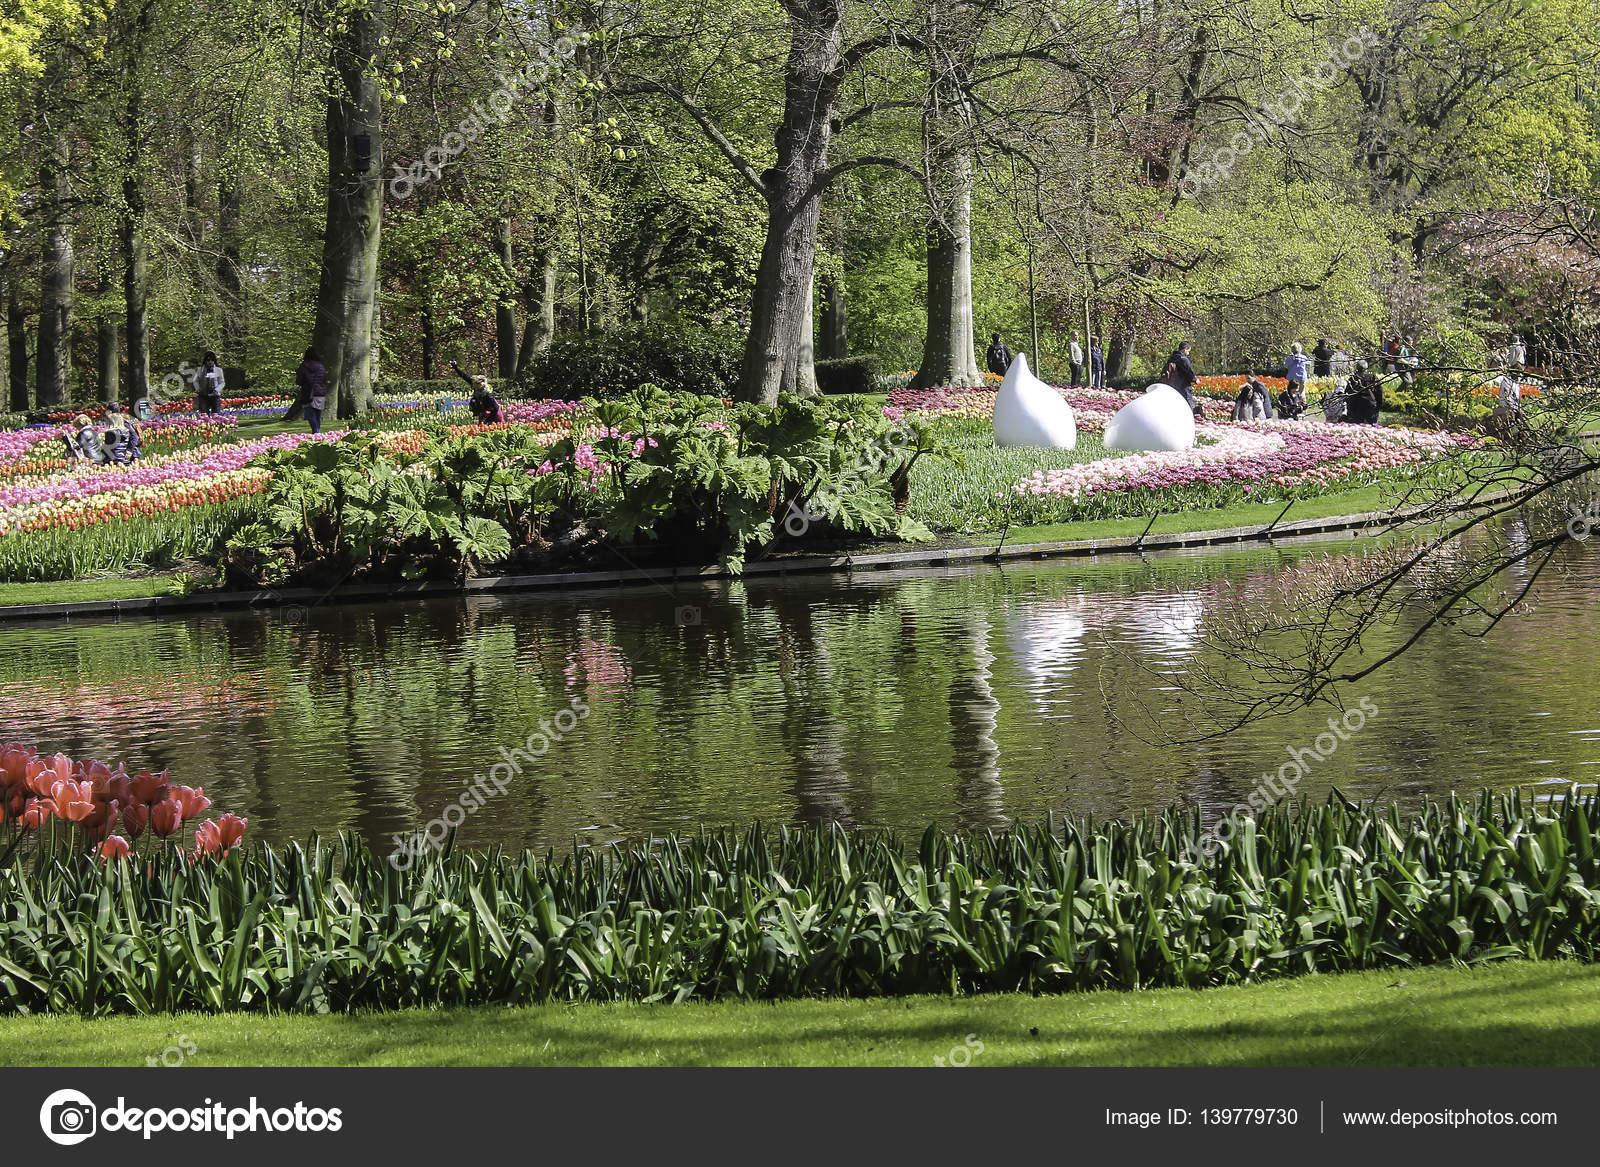 Bloementuin keukenhof redactionele stockfoto for Www bloem en tuin nl